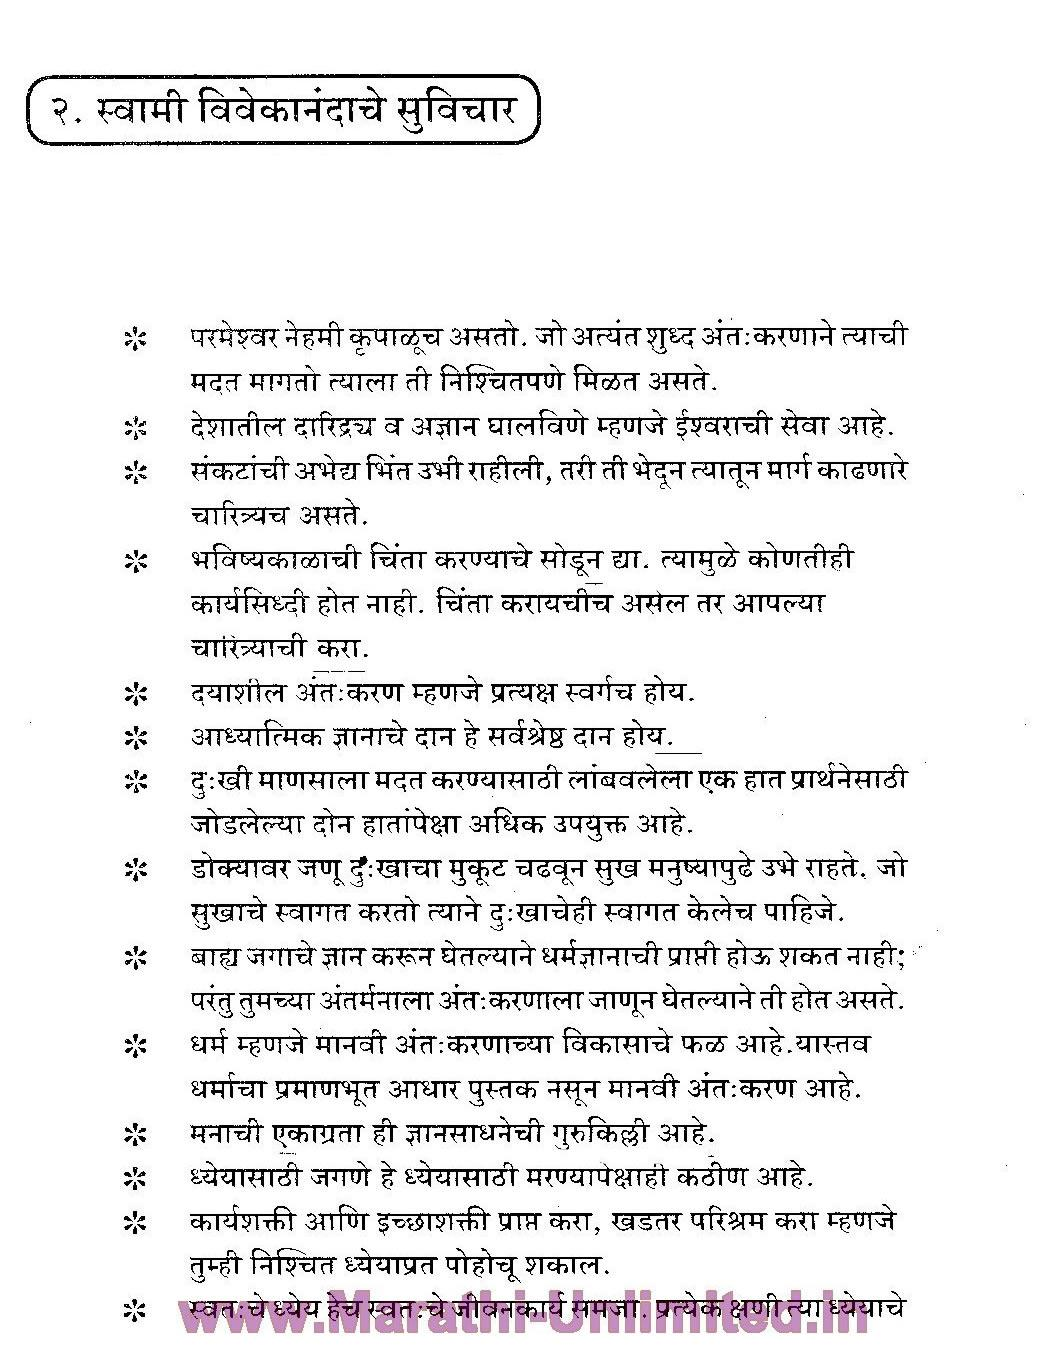 very short essay on swami vivekananda Swami vivekananda was a great social reformer theology religion essay telling swami vivekananda was very much vivekananda in a short life.